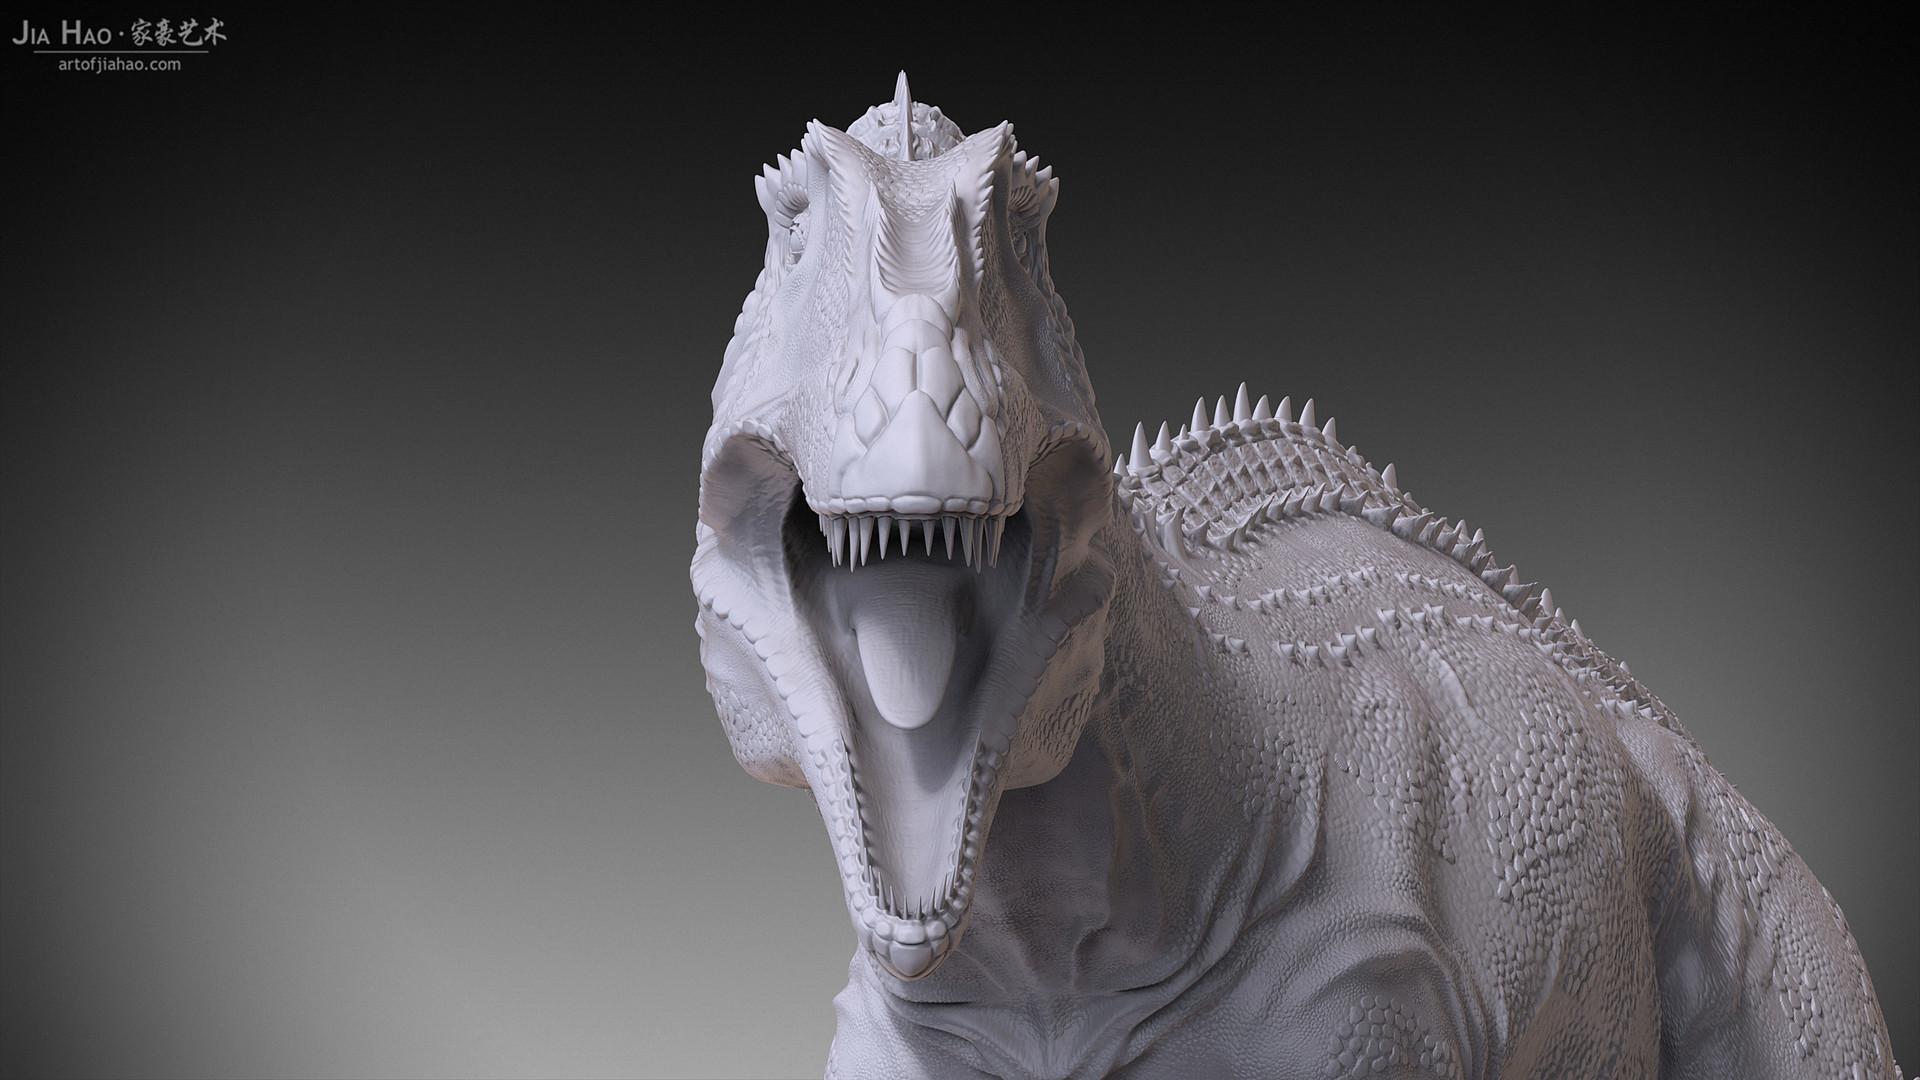 Jia hao acrocanthosaurus 06